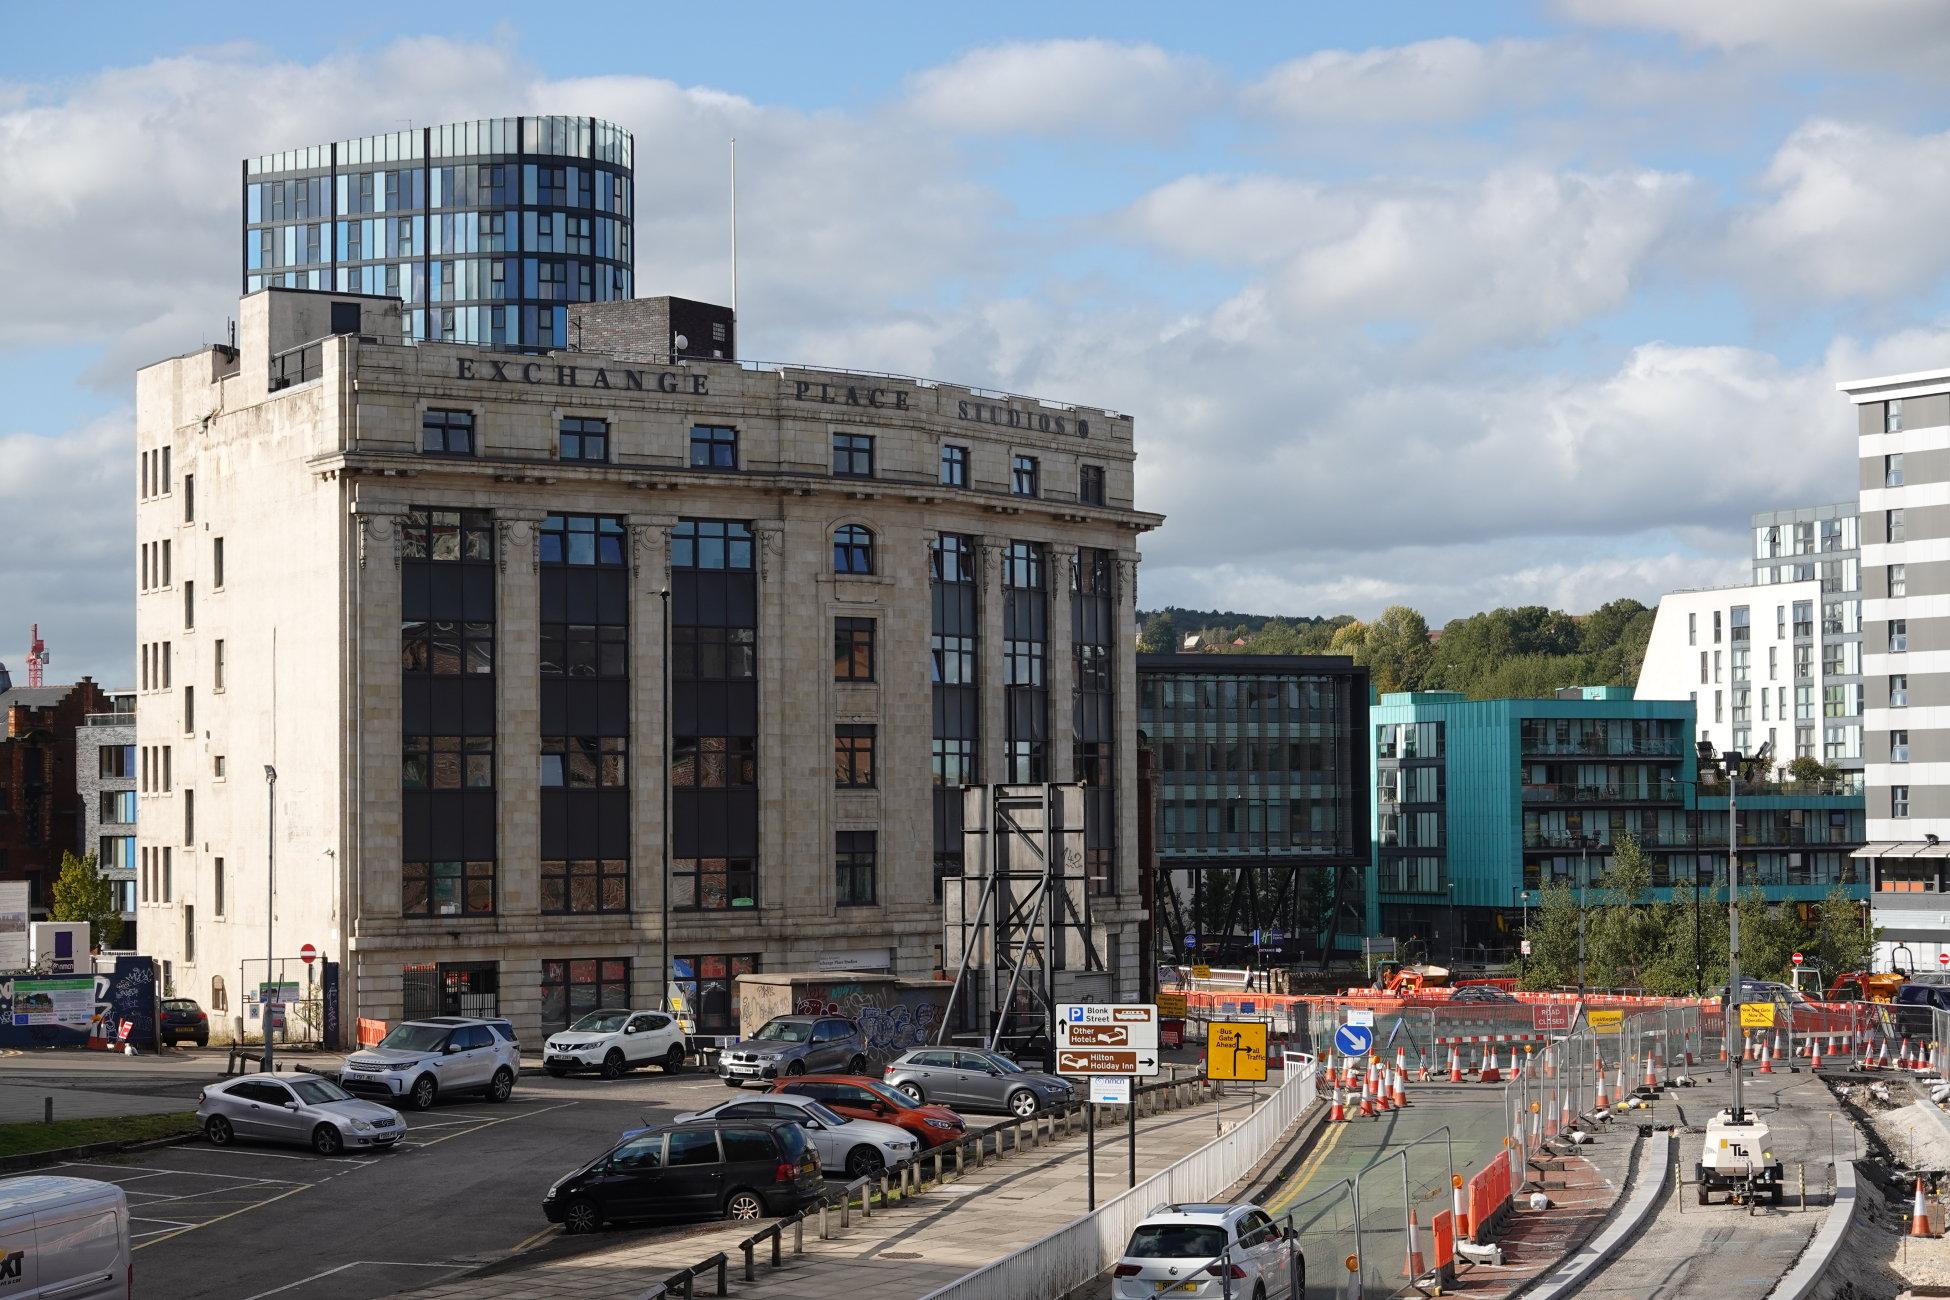 Sheffield Exchange